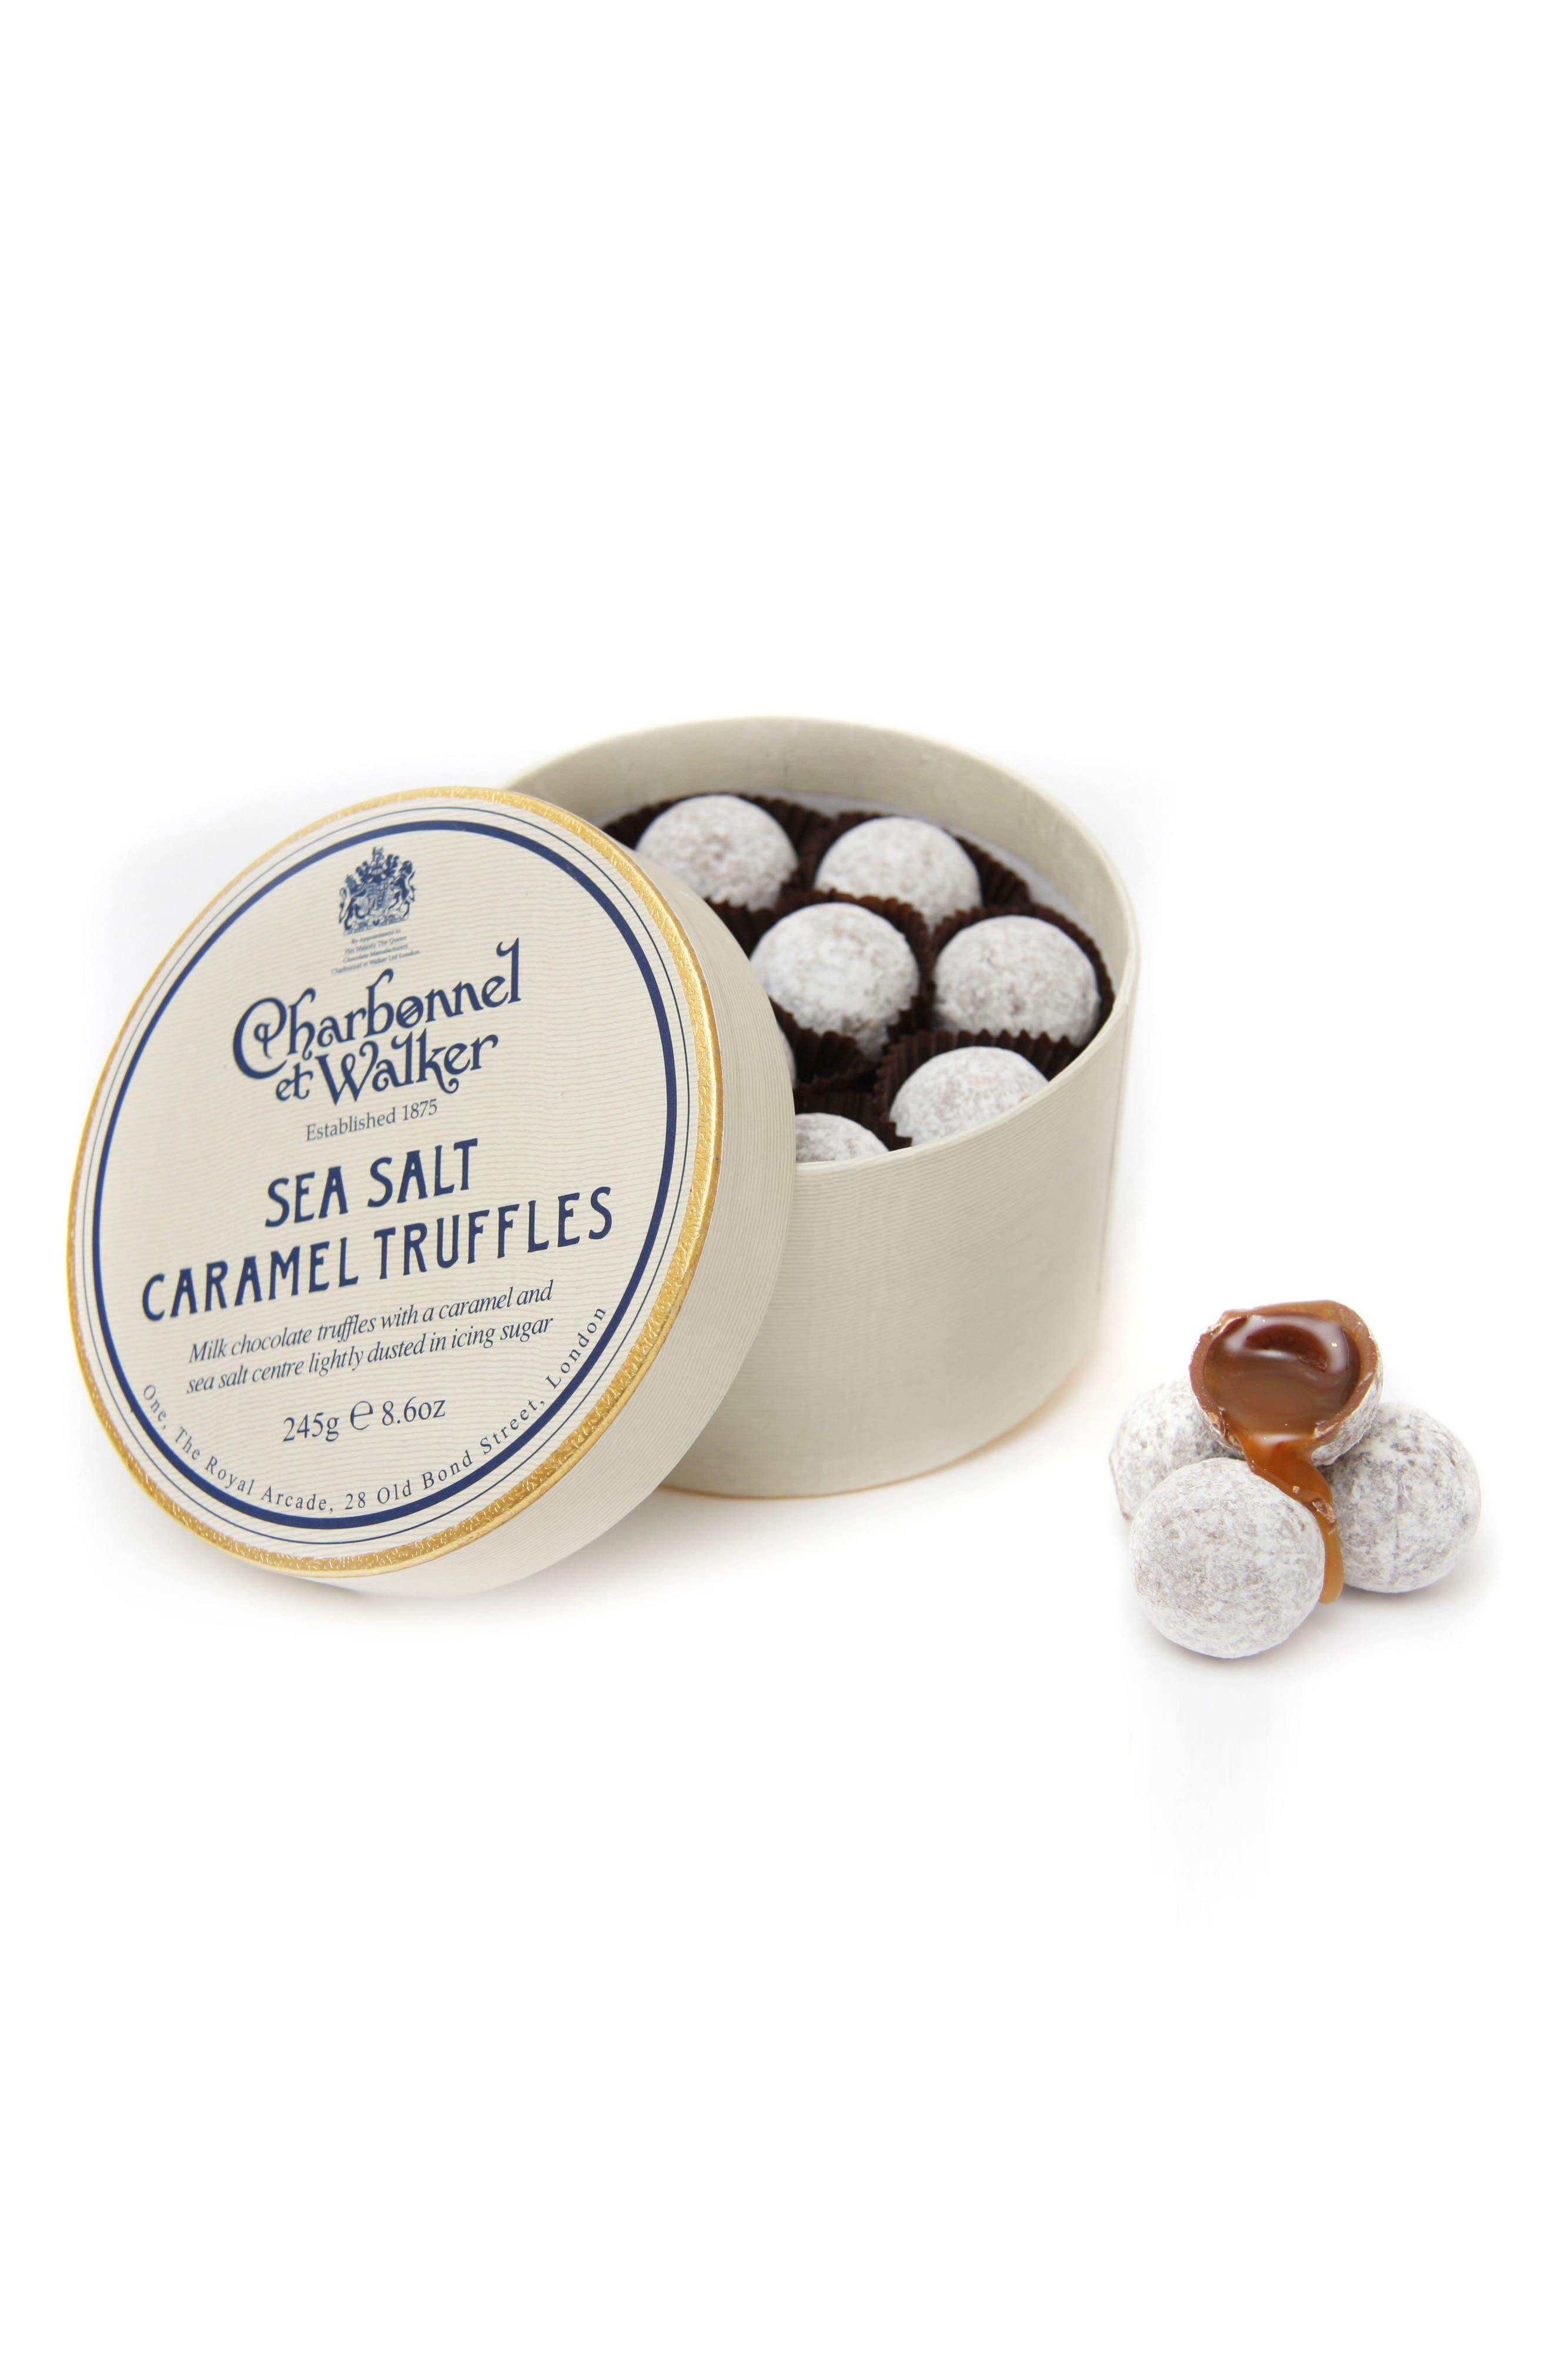 Sea Salt Caramel Milk Chocolate Truffles in Double Layer Gift Box,                             Main thumbnail 1, color,                             SEA SALT/ MILK CARAMEL